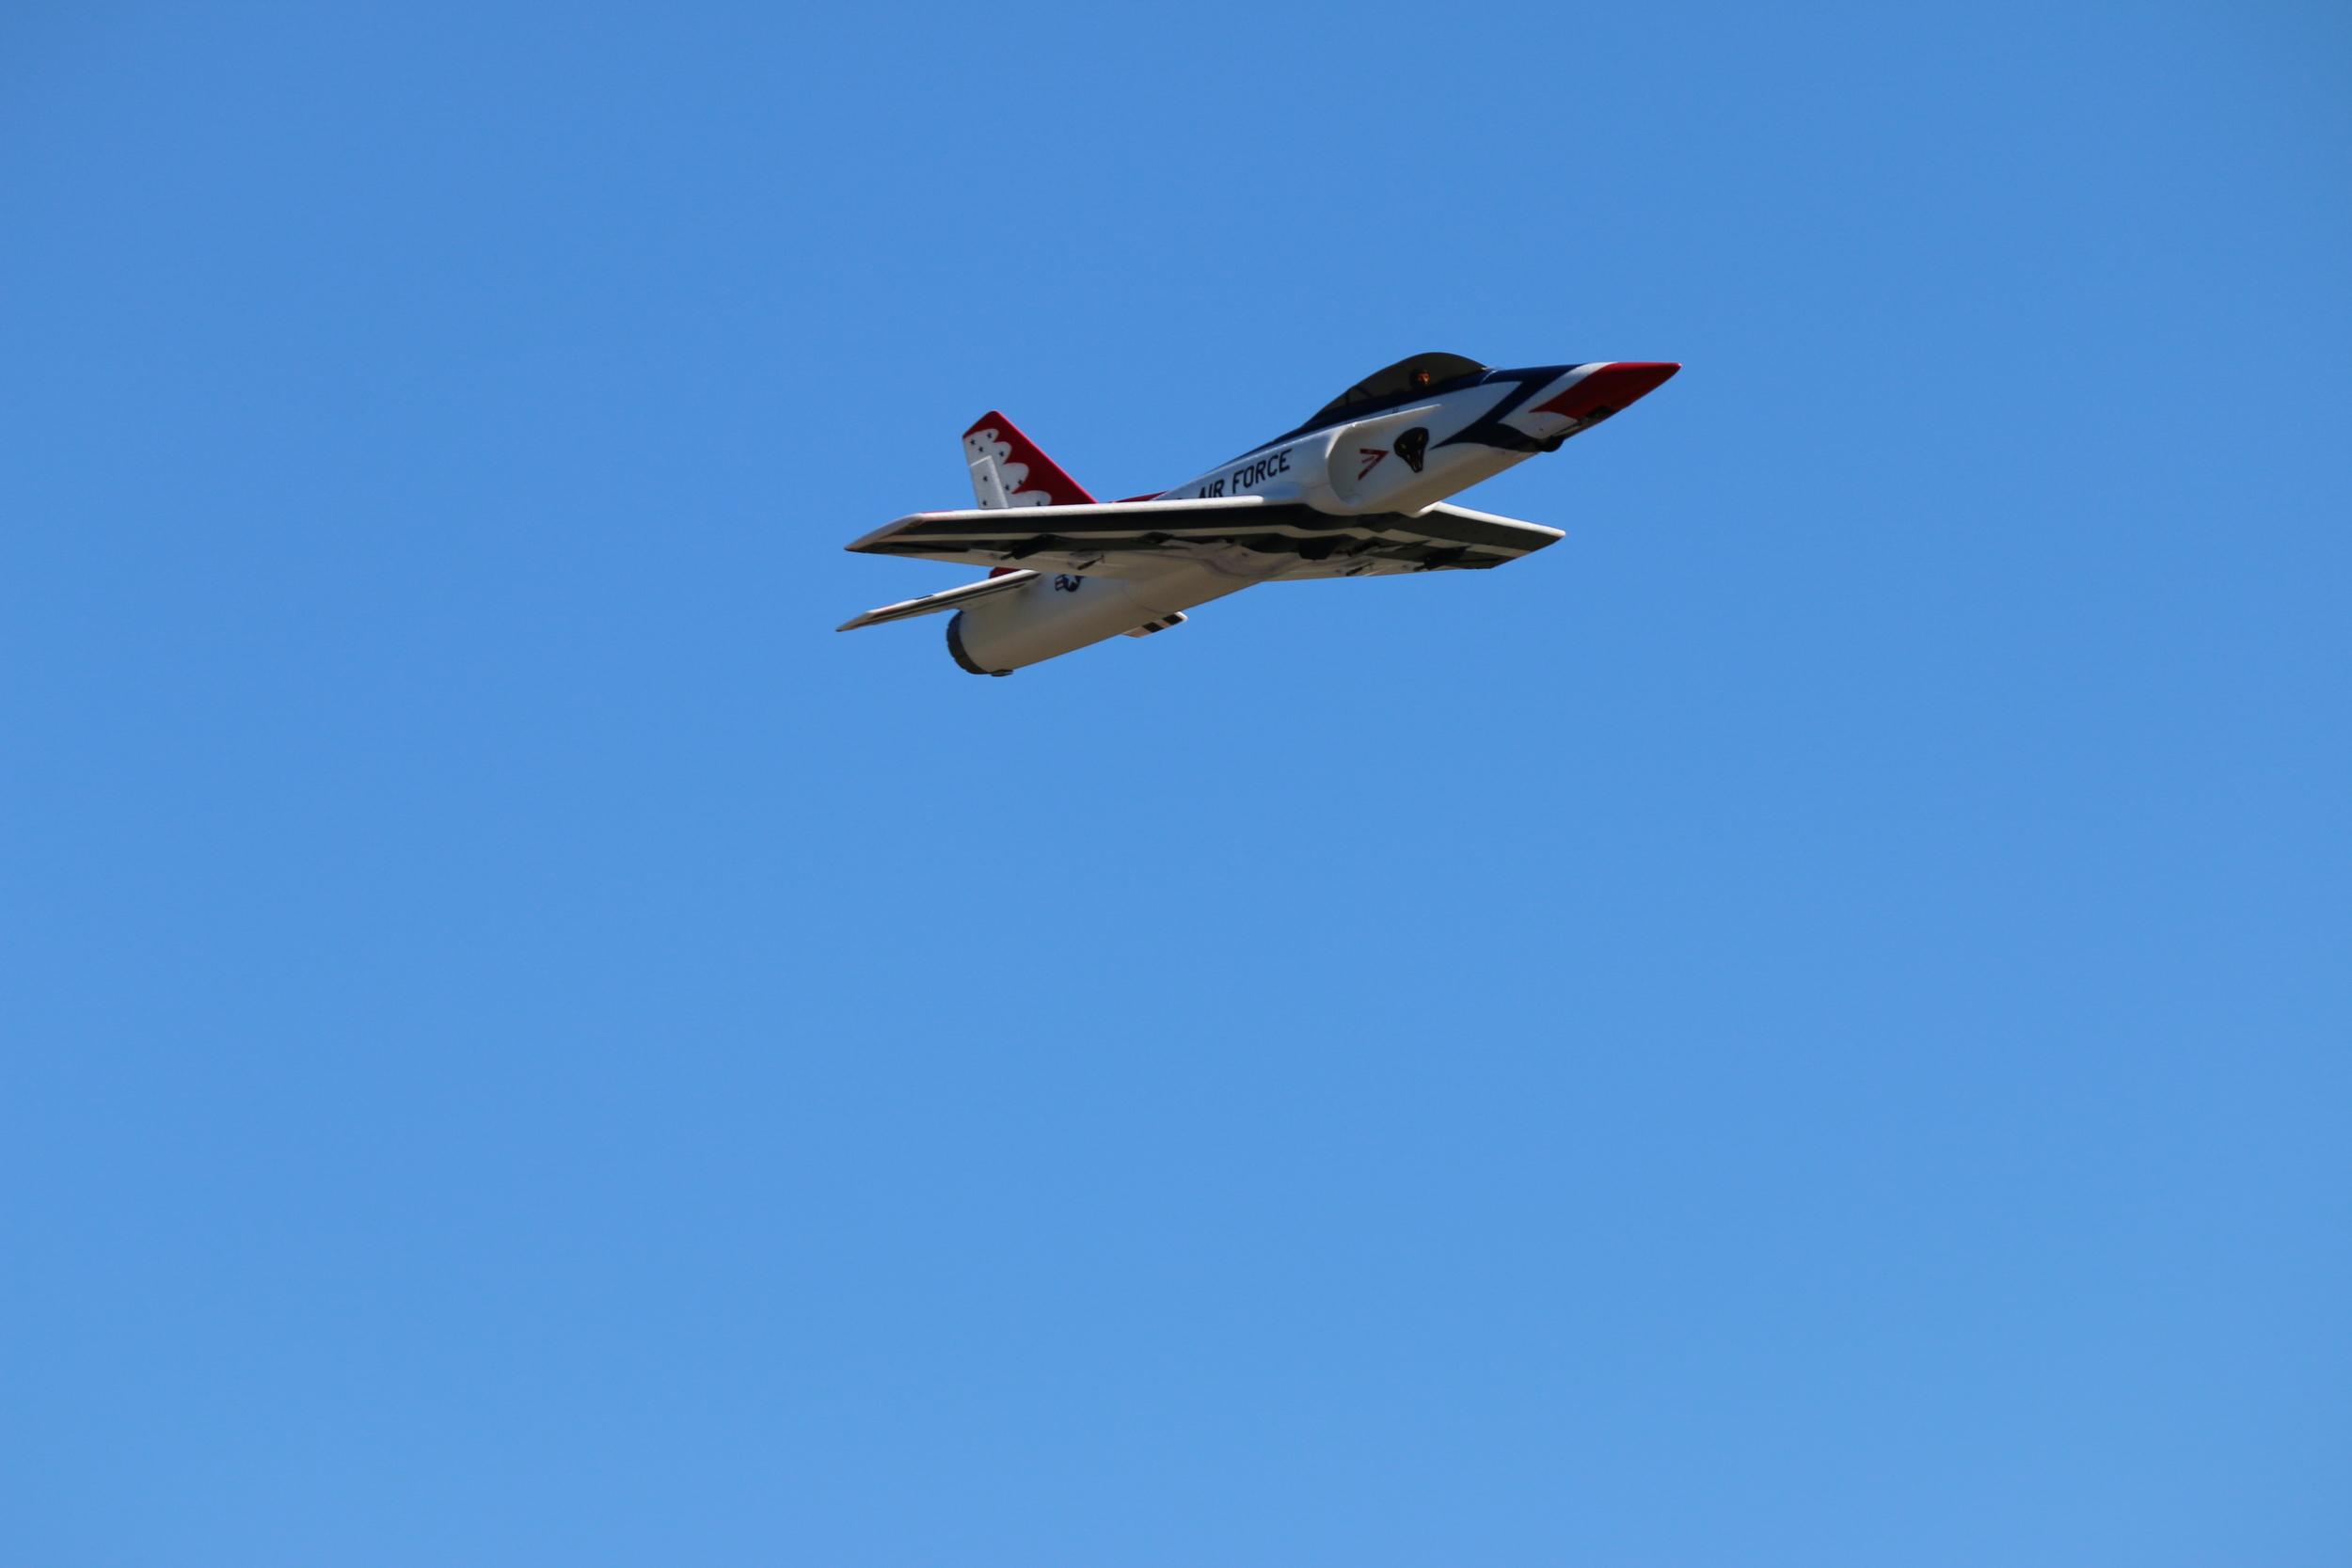 plane airforce.jpg